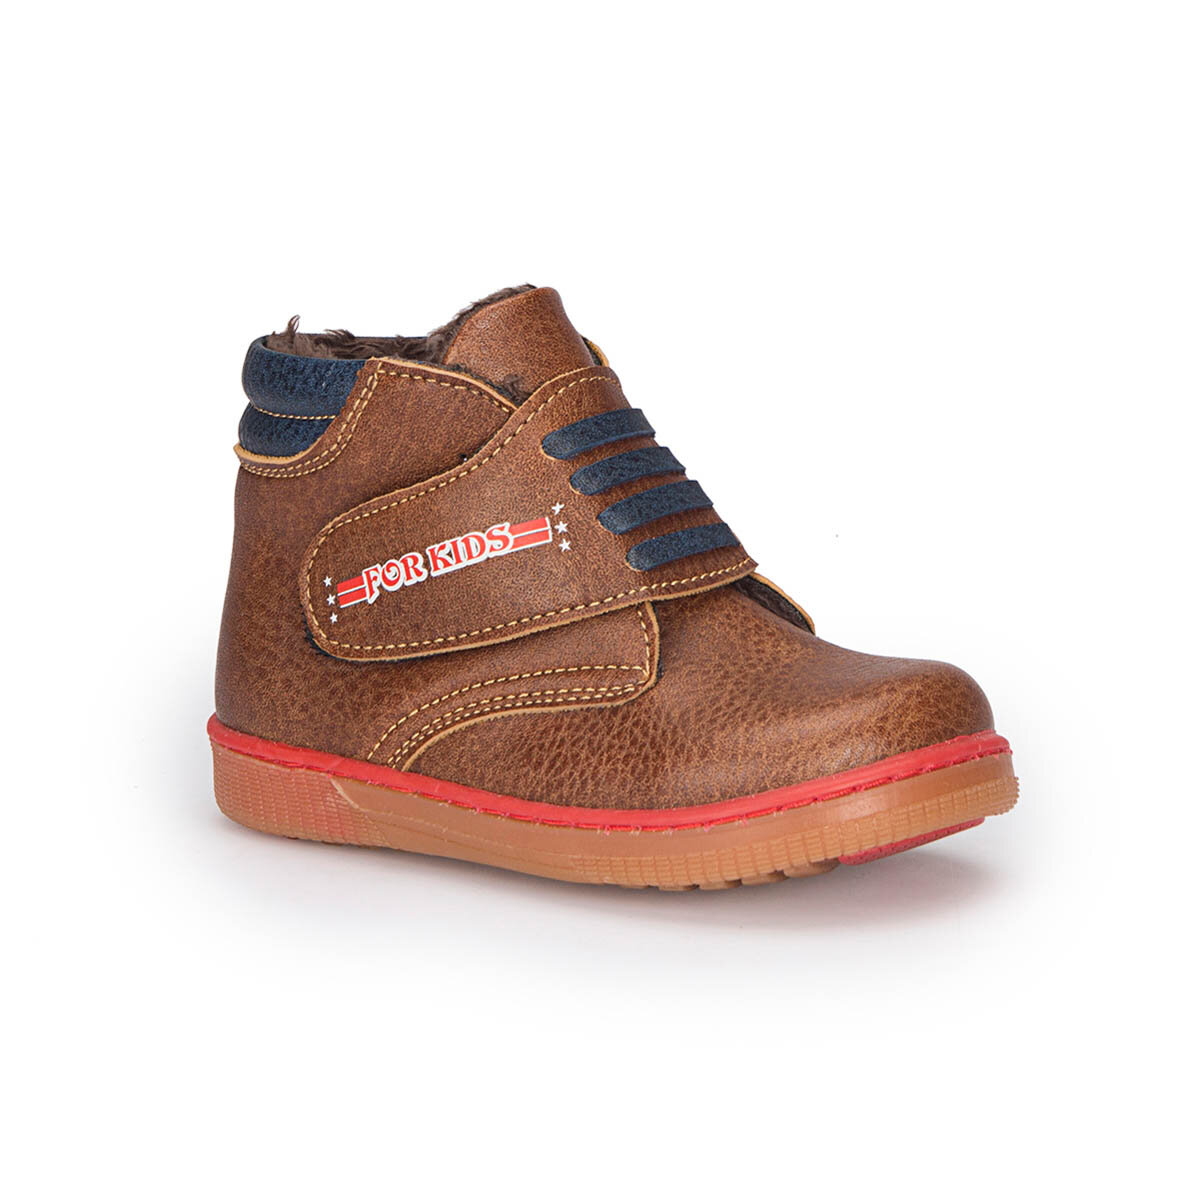 FLO 72.509563.B Brown Male Child Sneaker Shoes Polaris